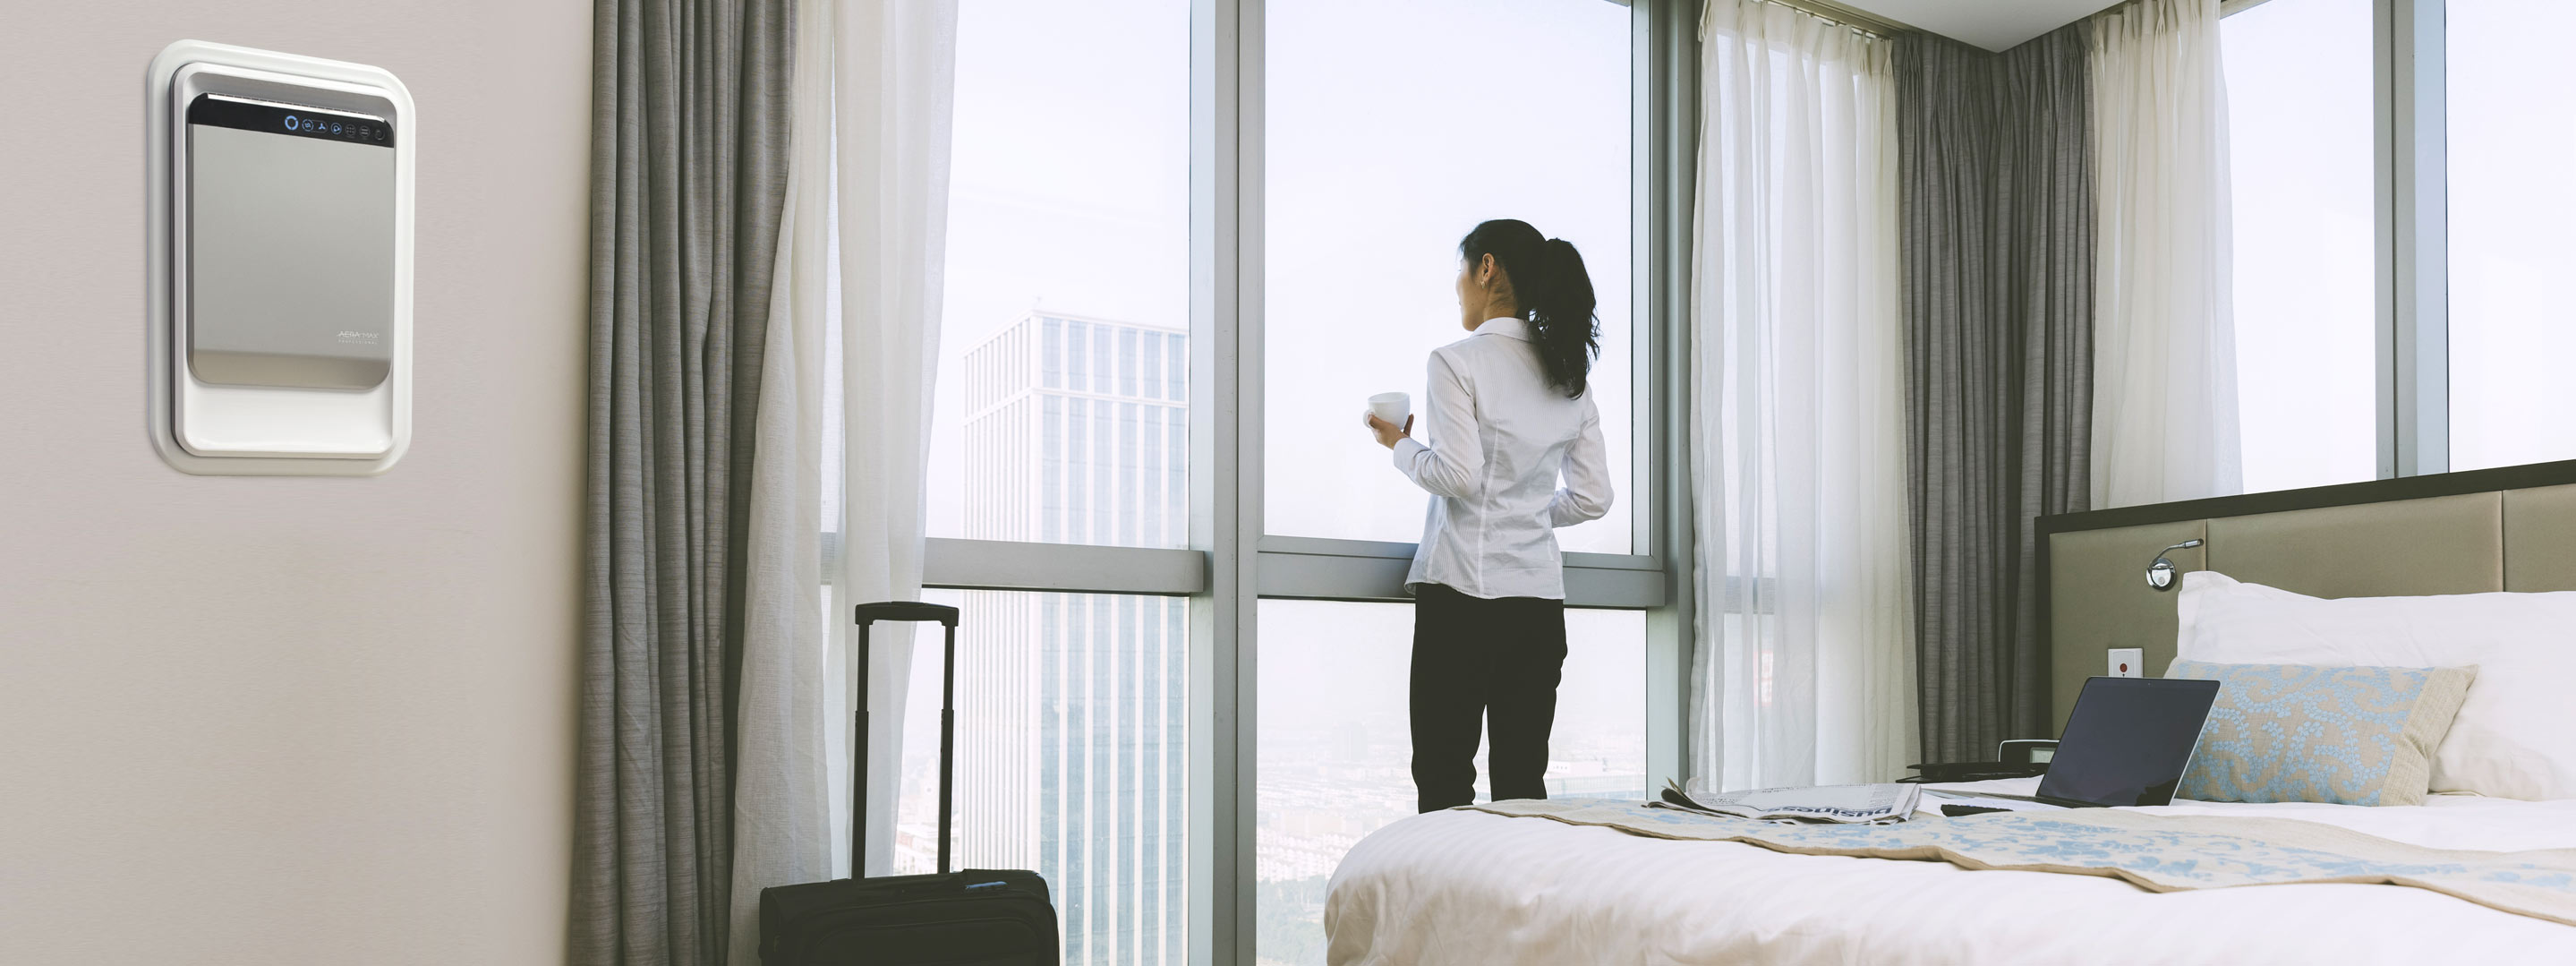 AeraMax Professional – Hostelería